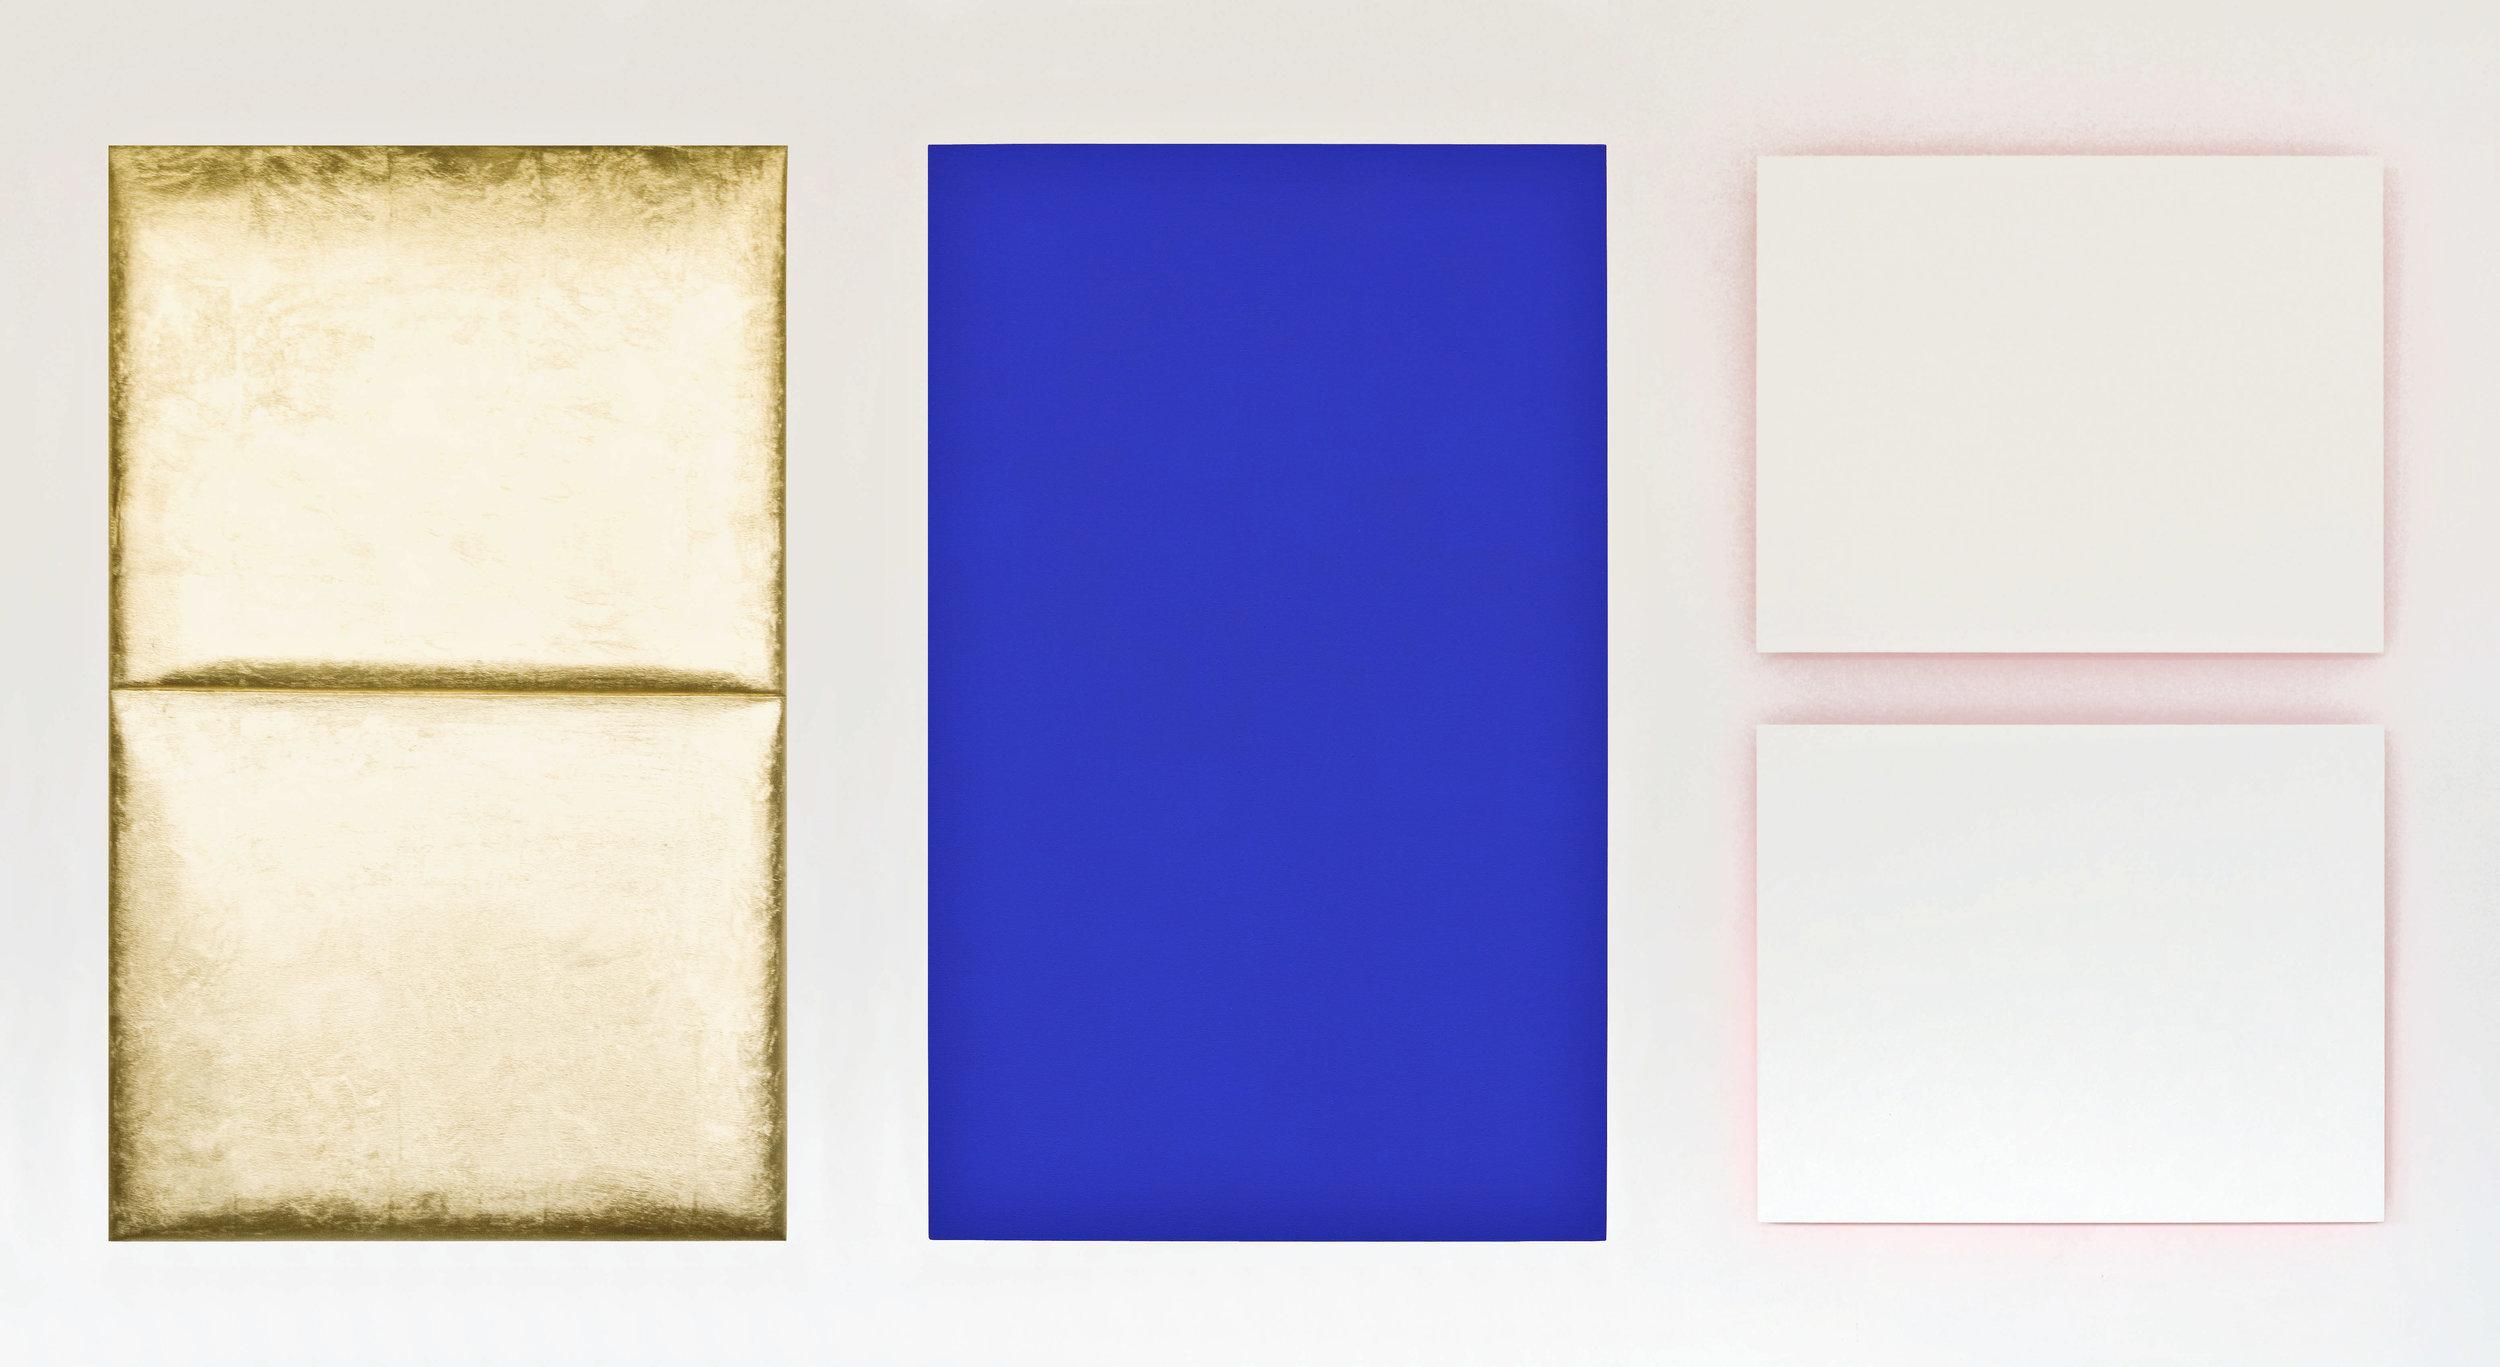 akril, medenina, les, dvakrat 110 x 70 dvakrat 50 x 65 cm, 2003